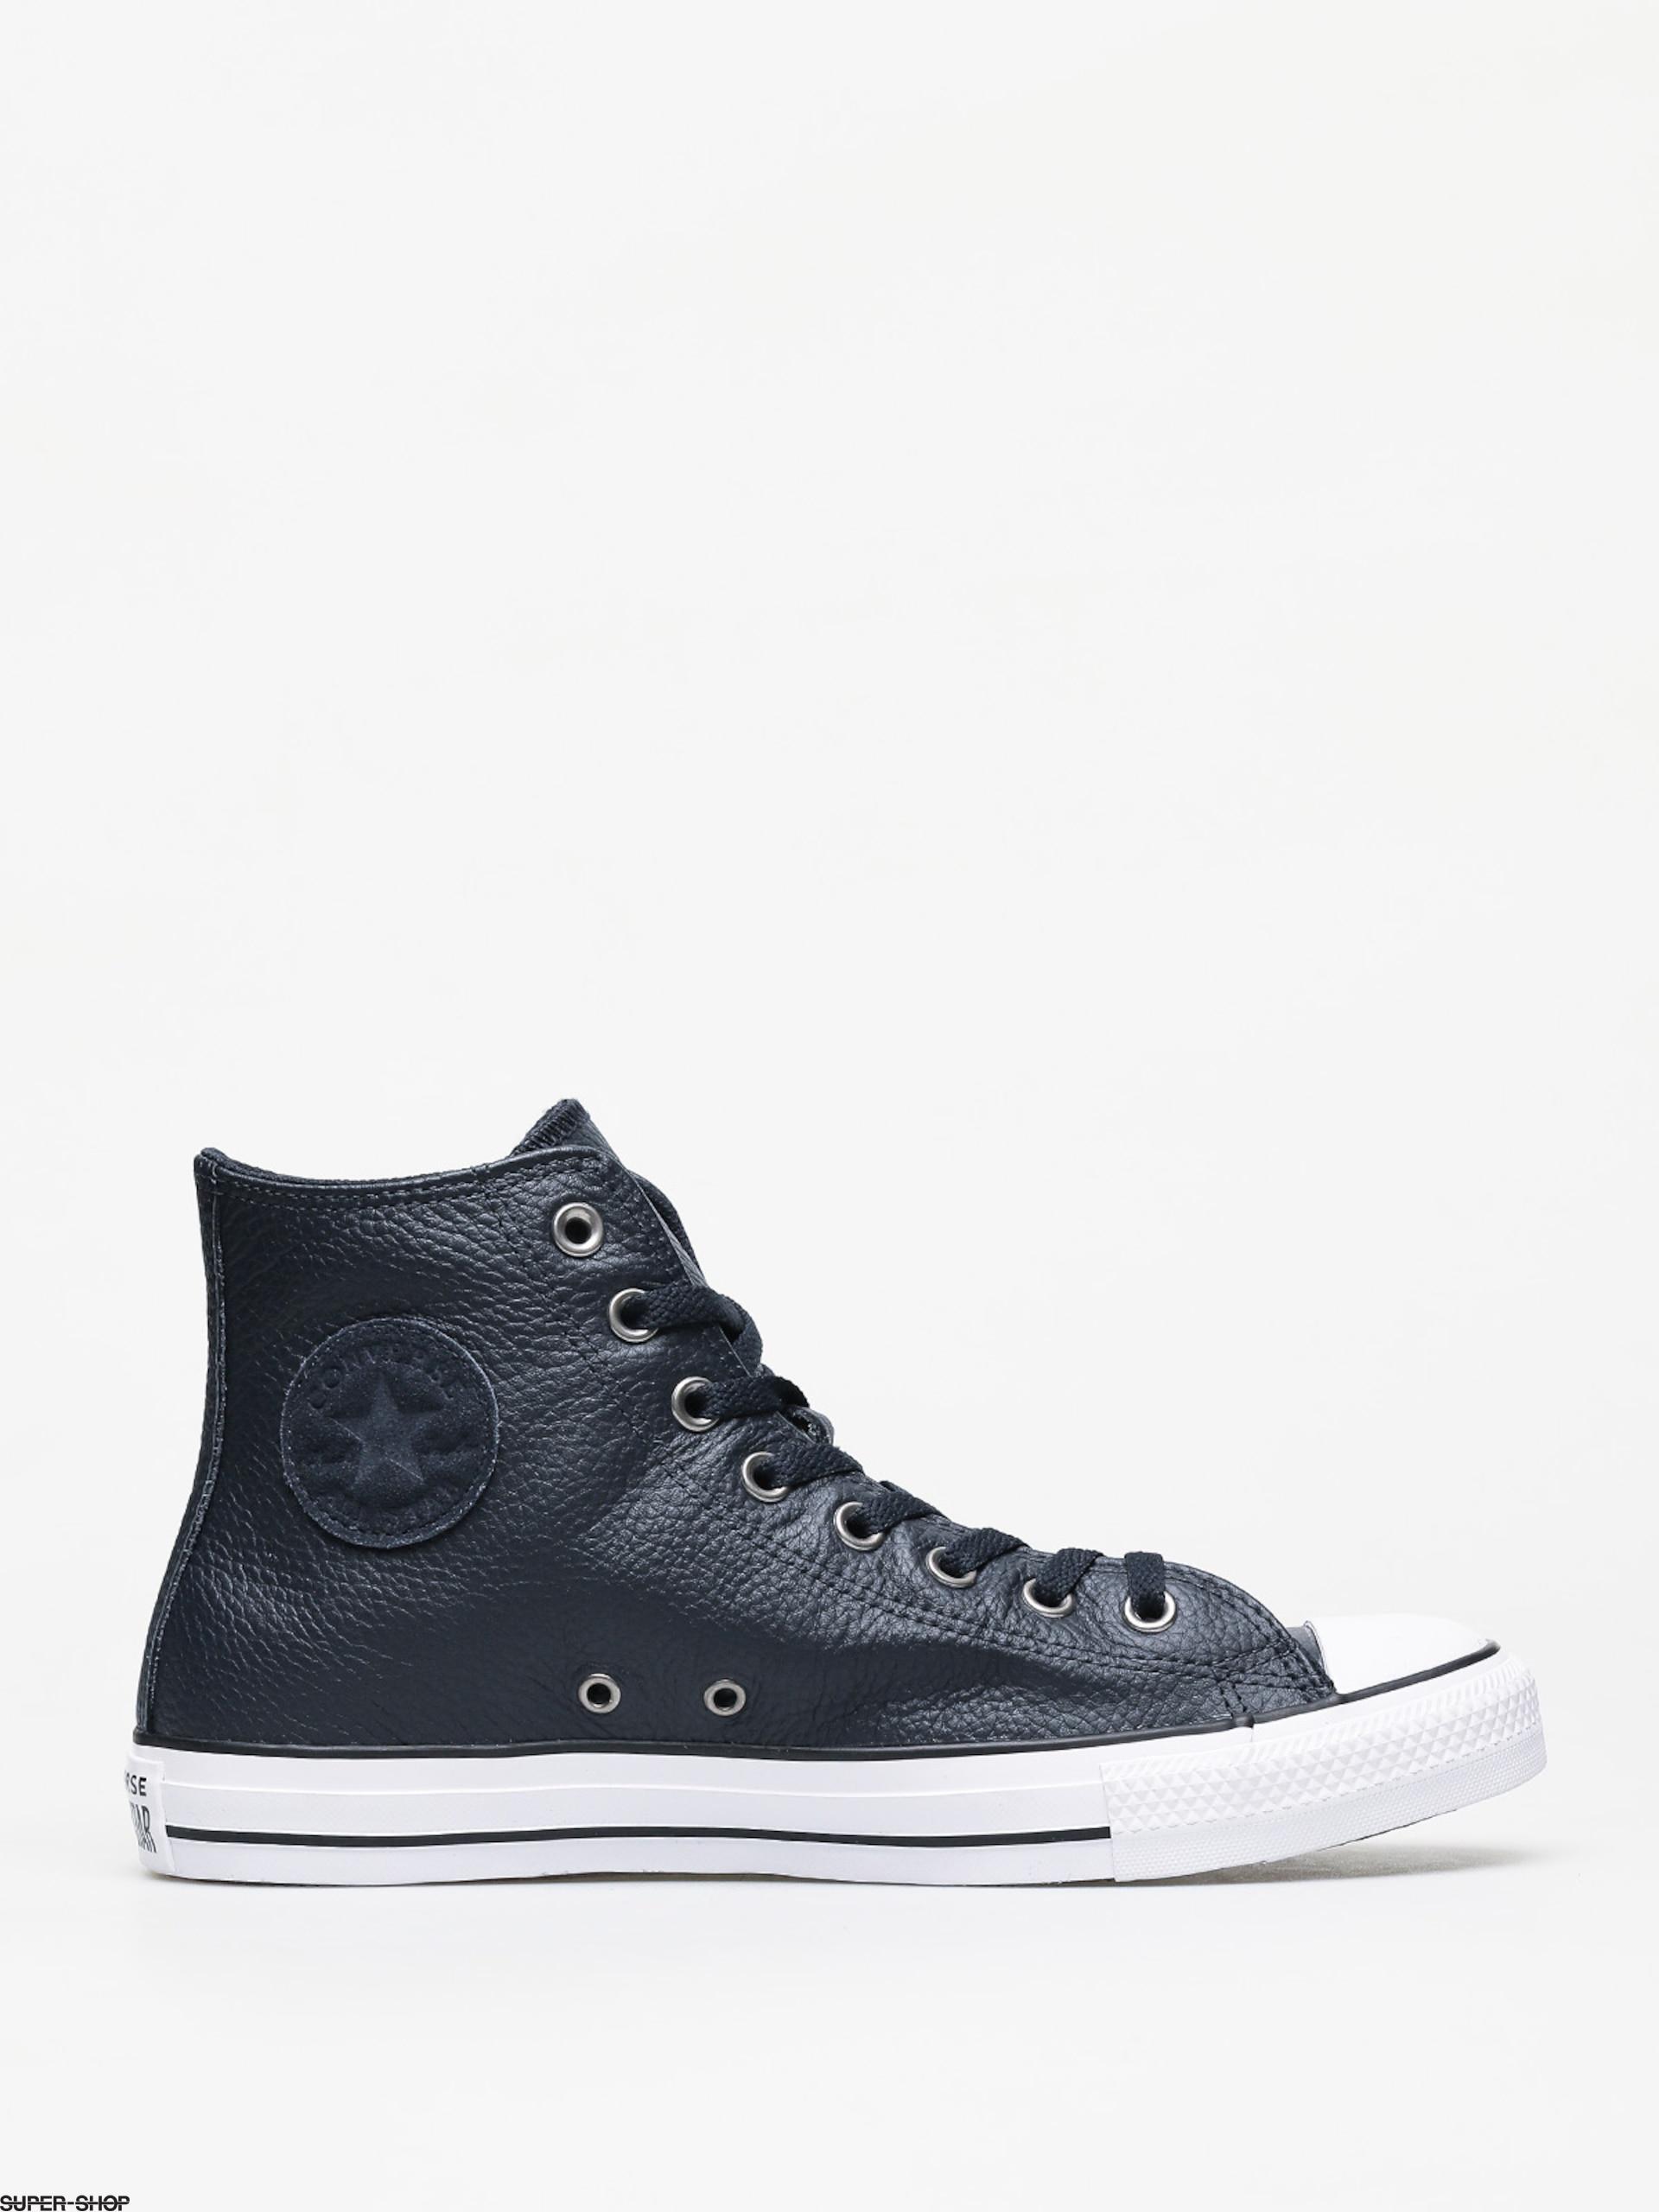 Enfermedad censura en lugar  Converse Chuck Taylor All Star Hi Leather Chucks (dark obsidian/white/black)